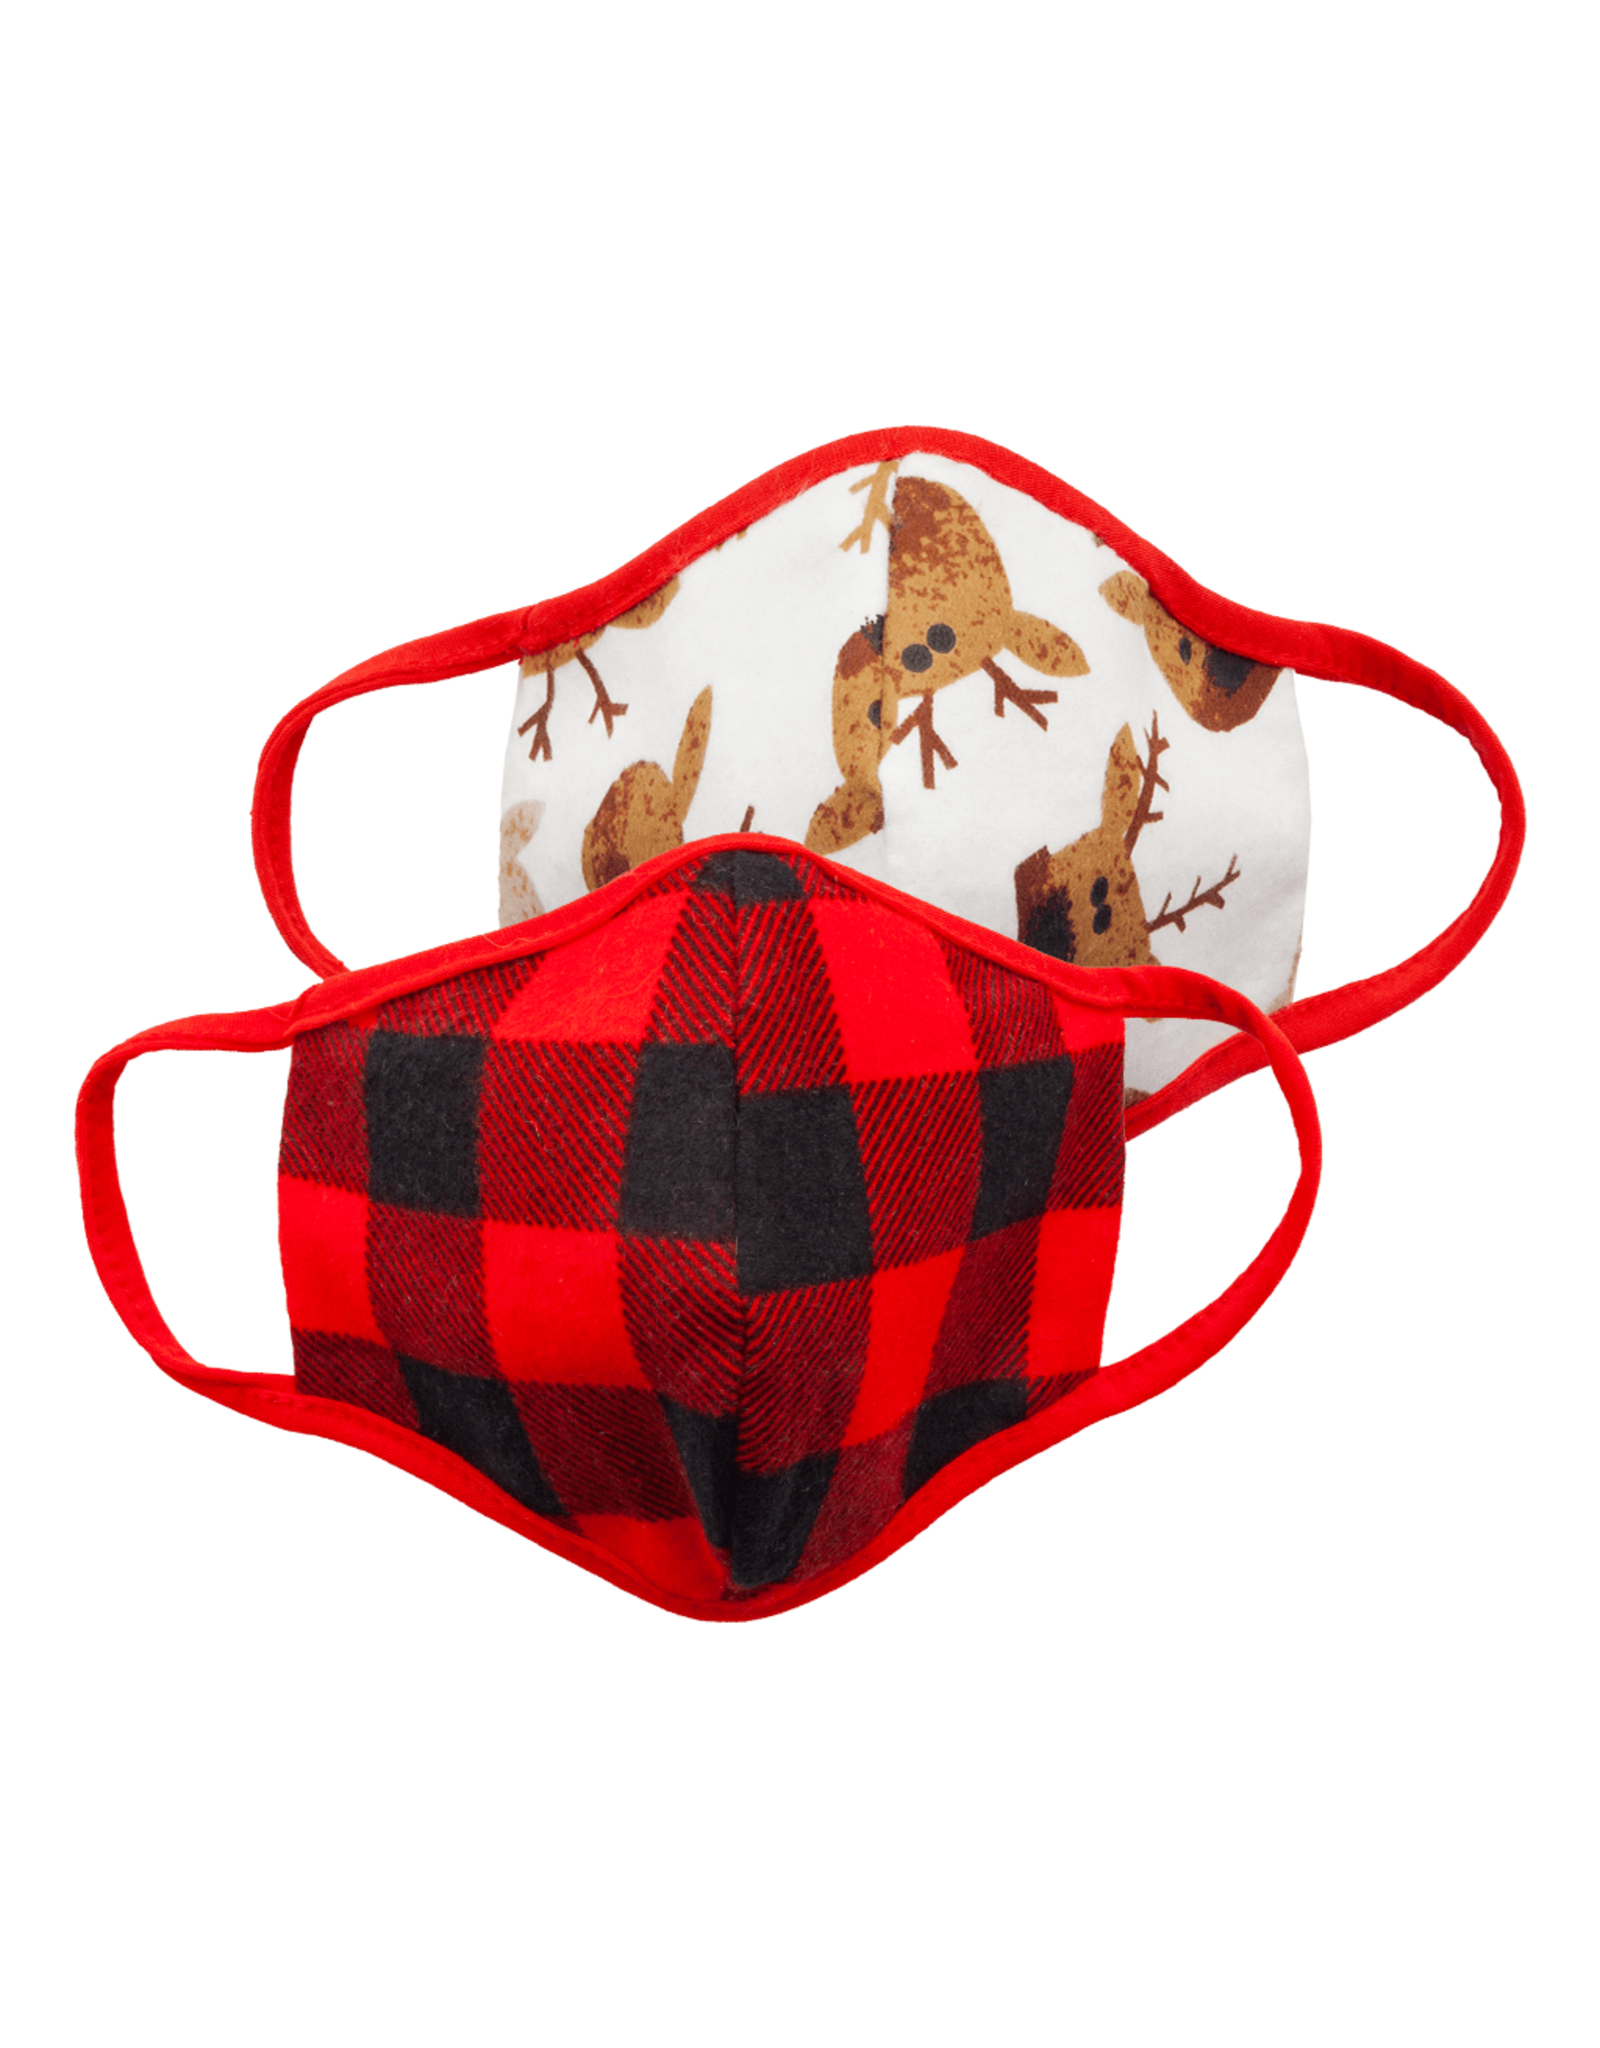 Great Pretenders Baby Moose & Buffalo Plaid Mask Set, 2 pcs.